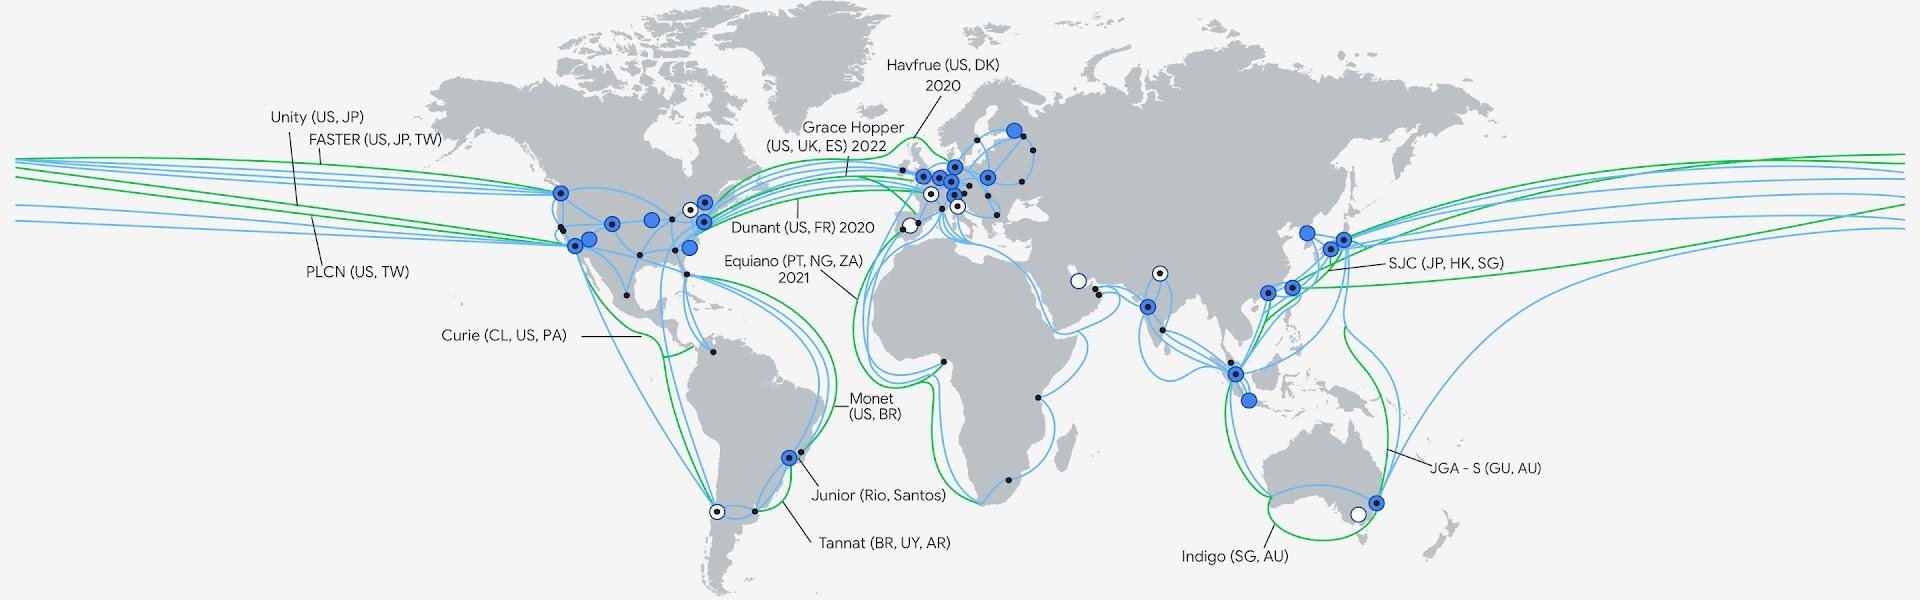 Mappa dell'infrastruttura Google Cloud